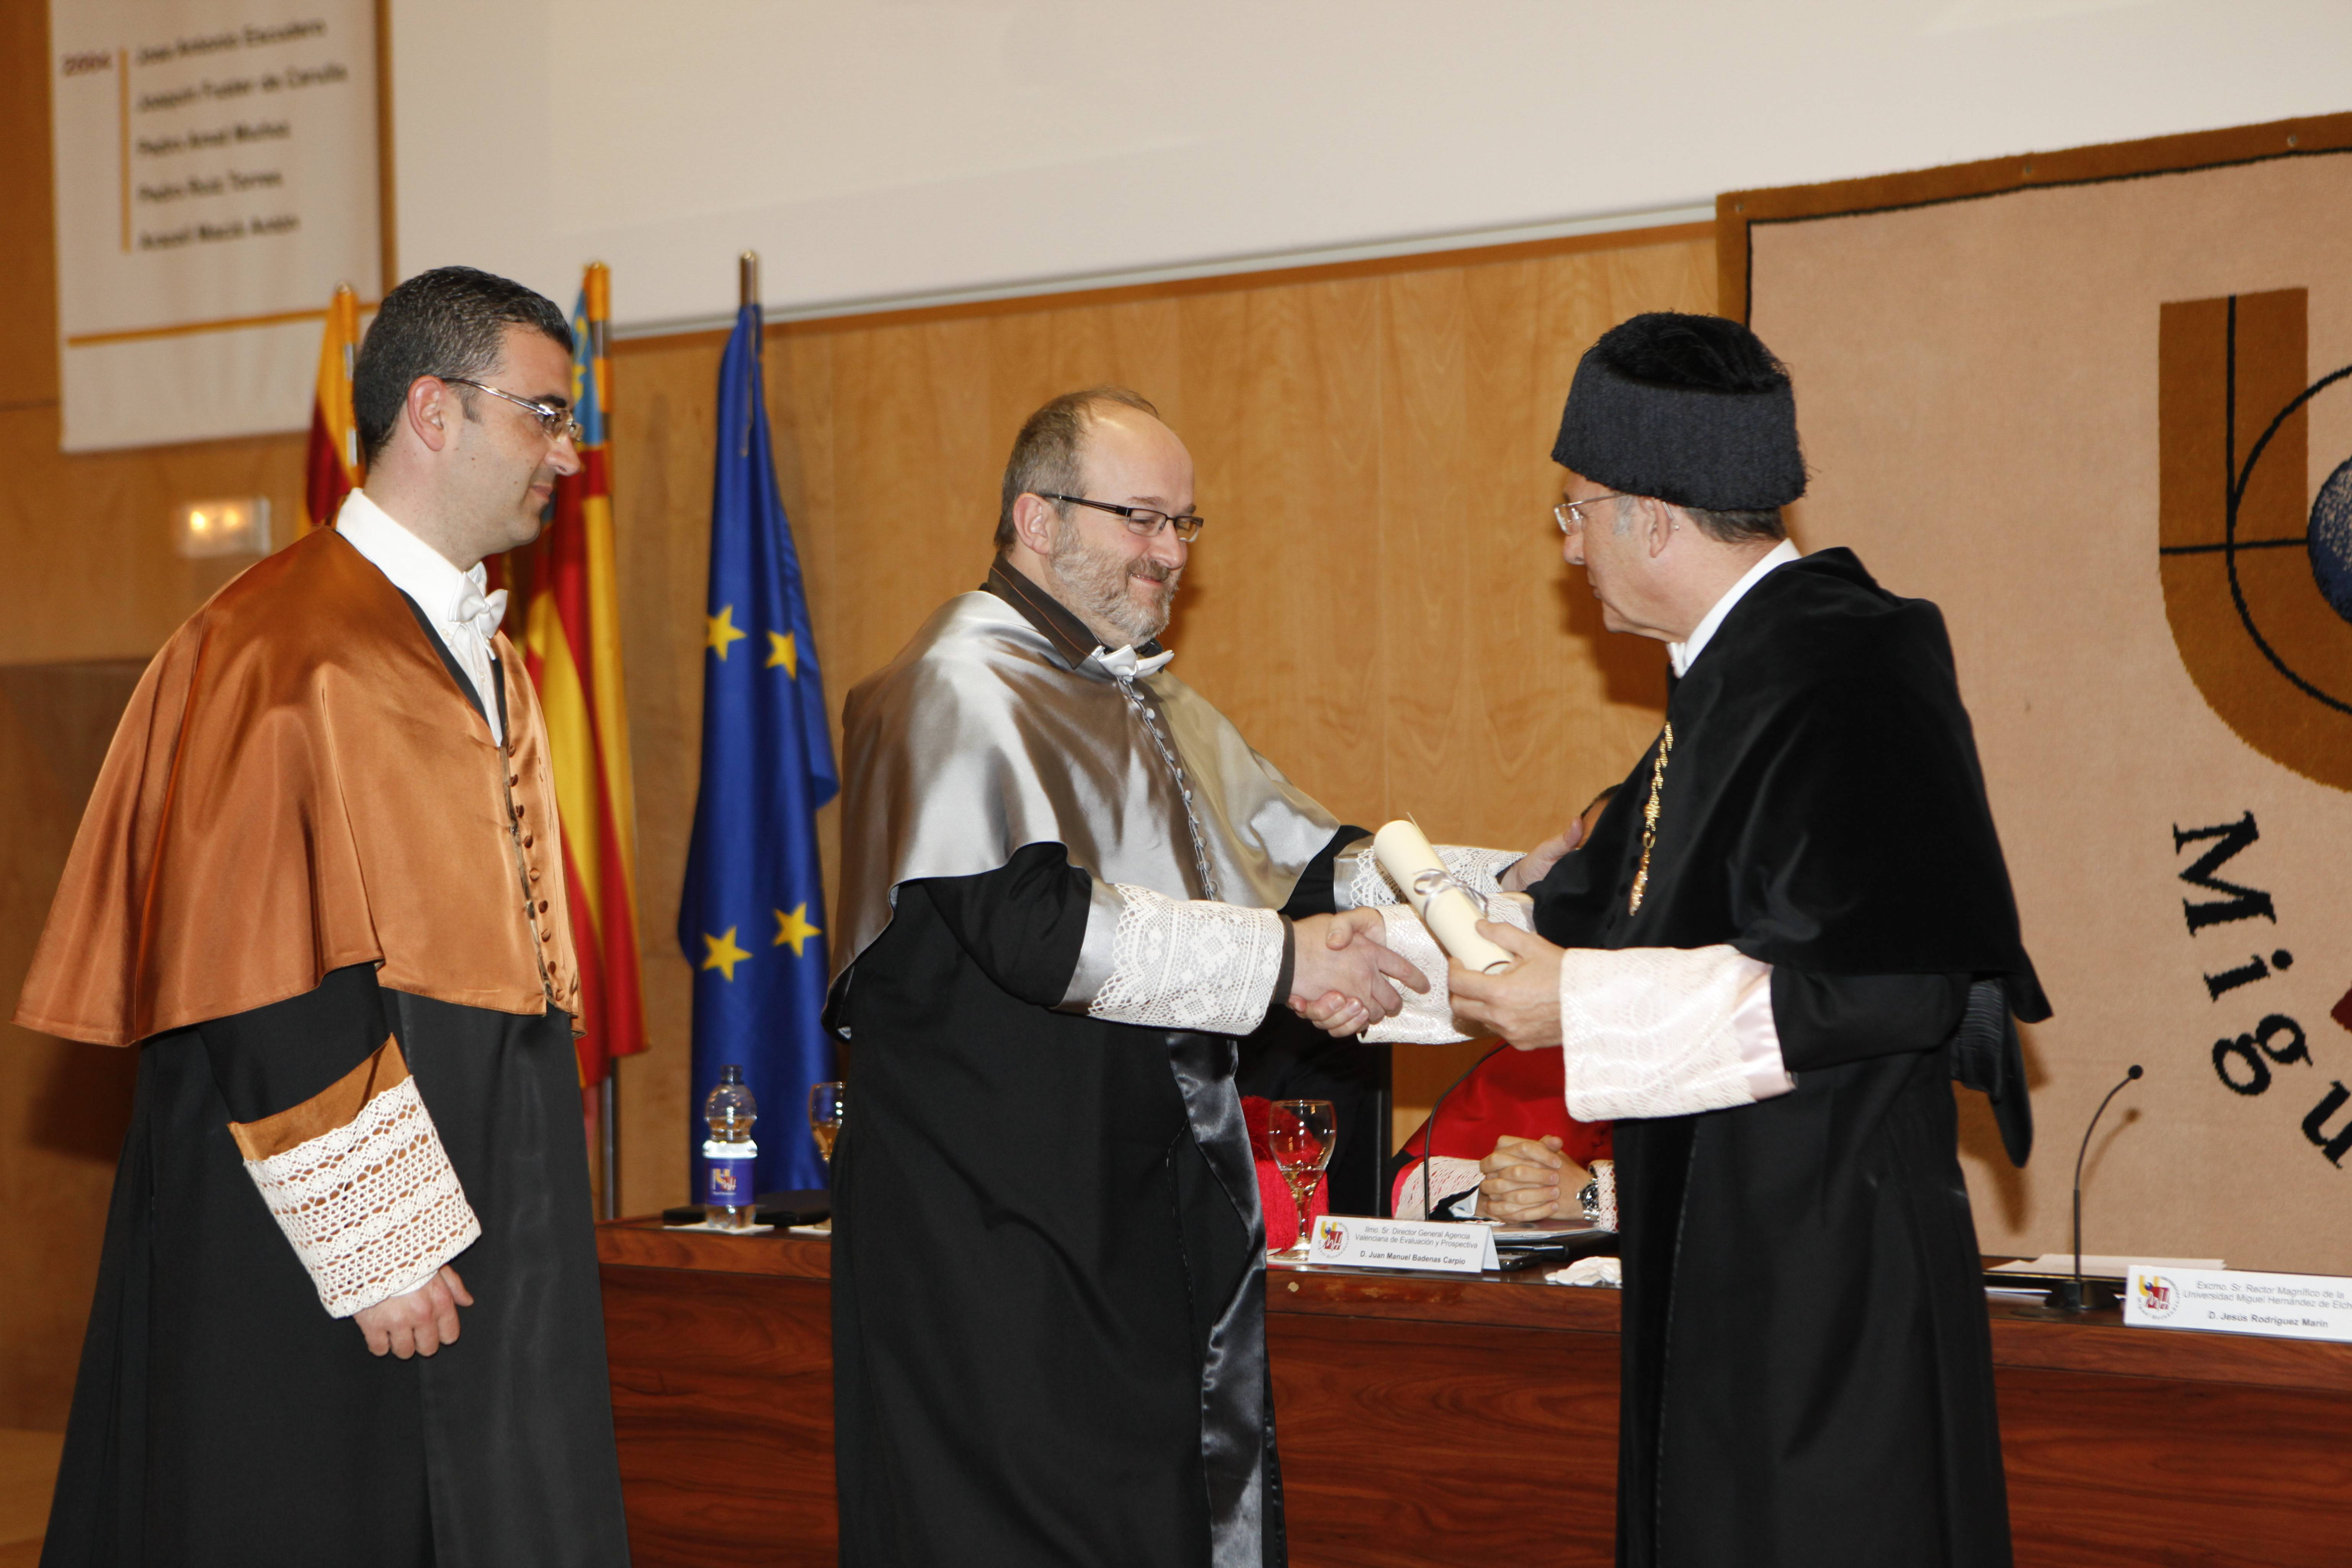 doctor-honoris-causa-luis-gamir_mg_1113.jpg